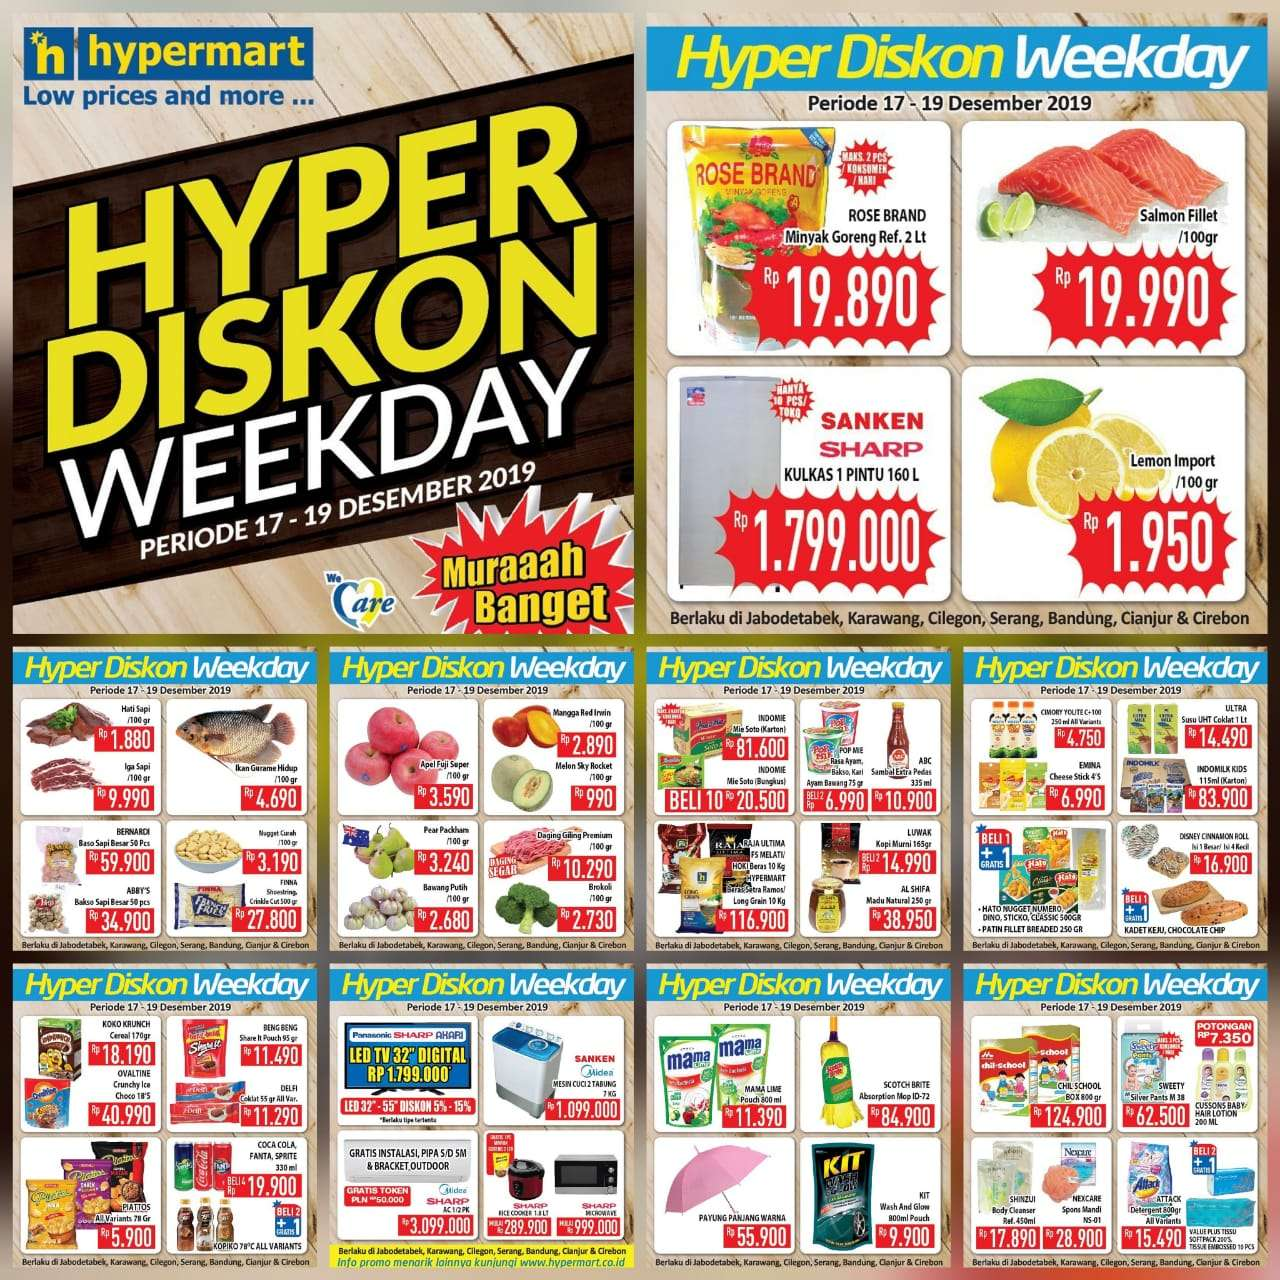 Diskon Katalog Promo Hyper Diskon Hypermart Periode 17-19 Desember 2019